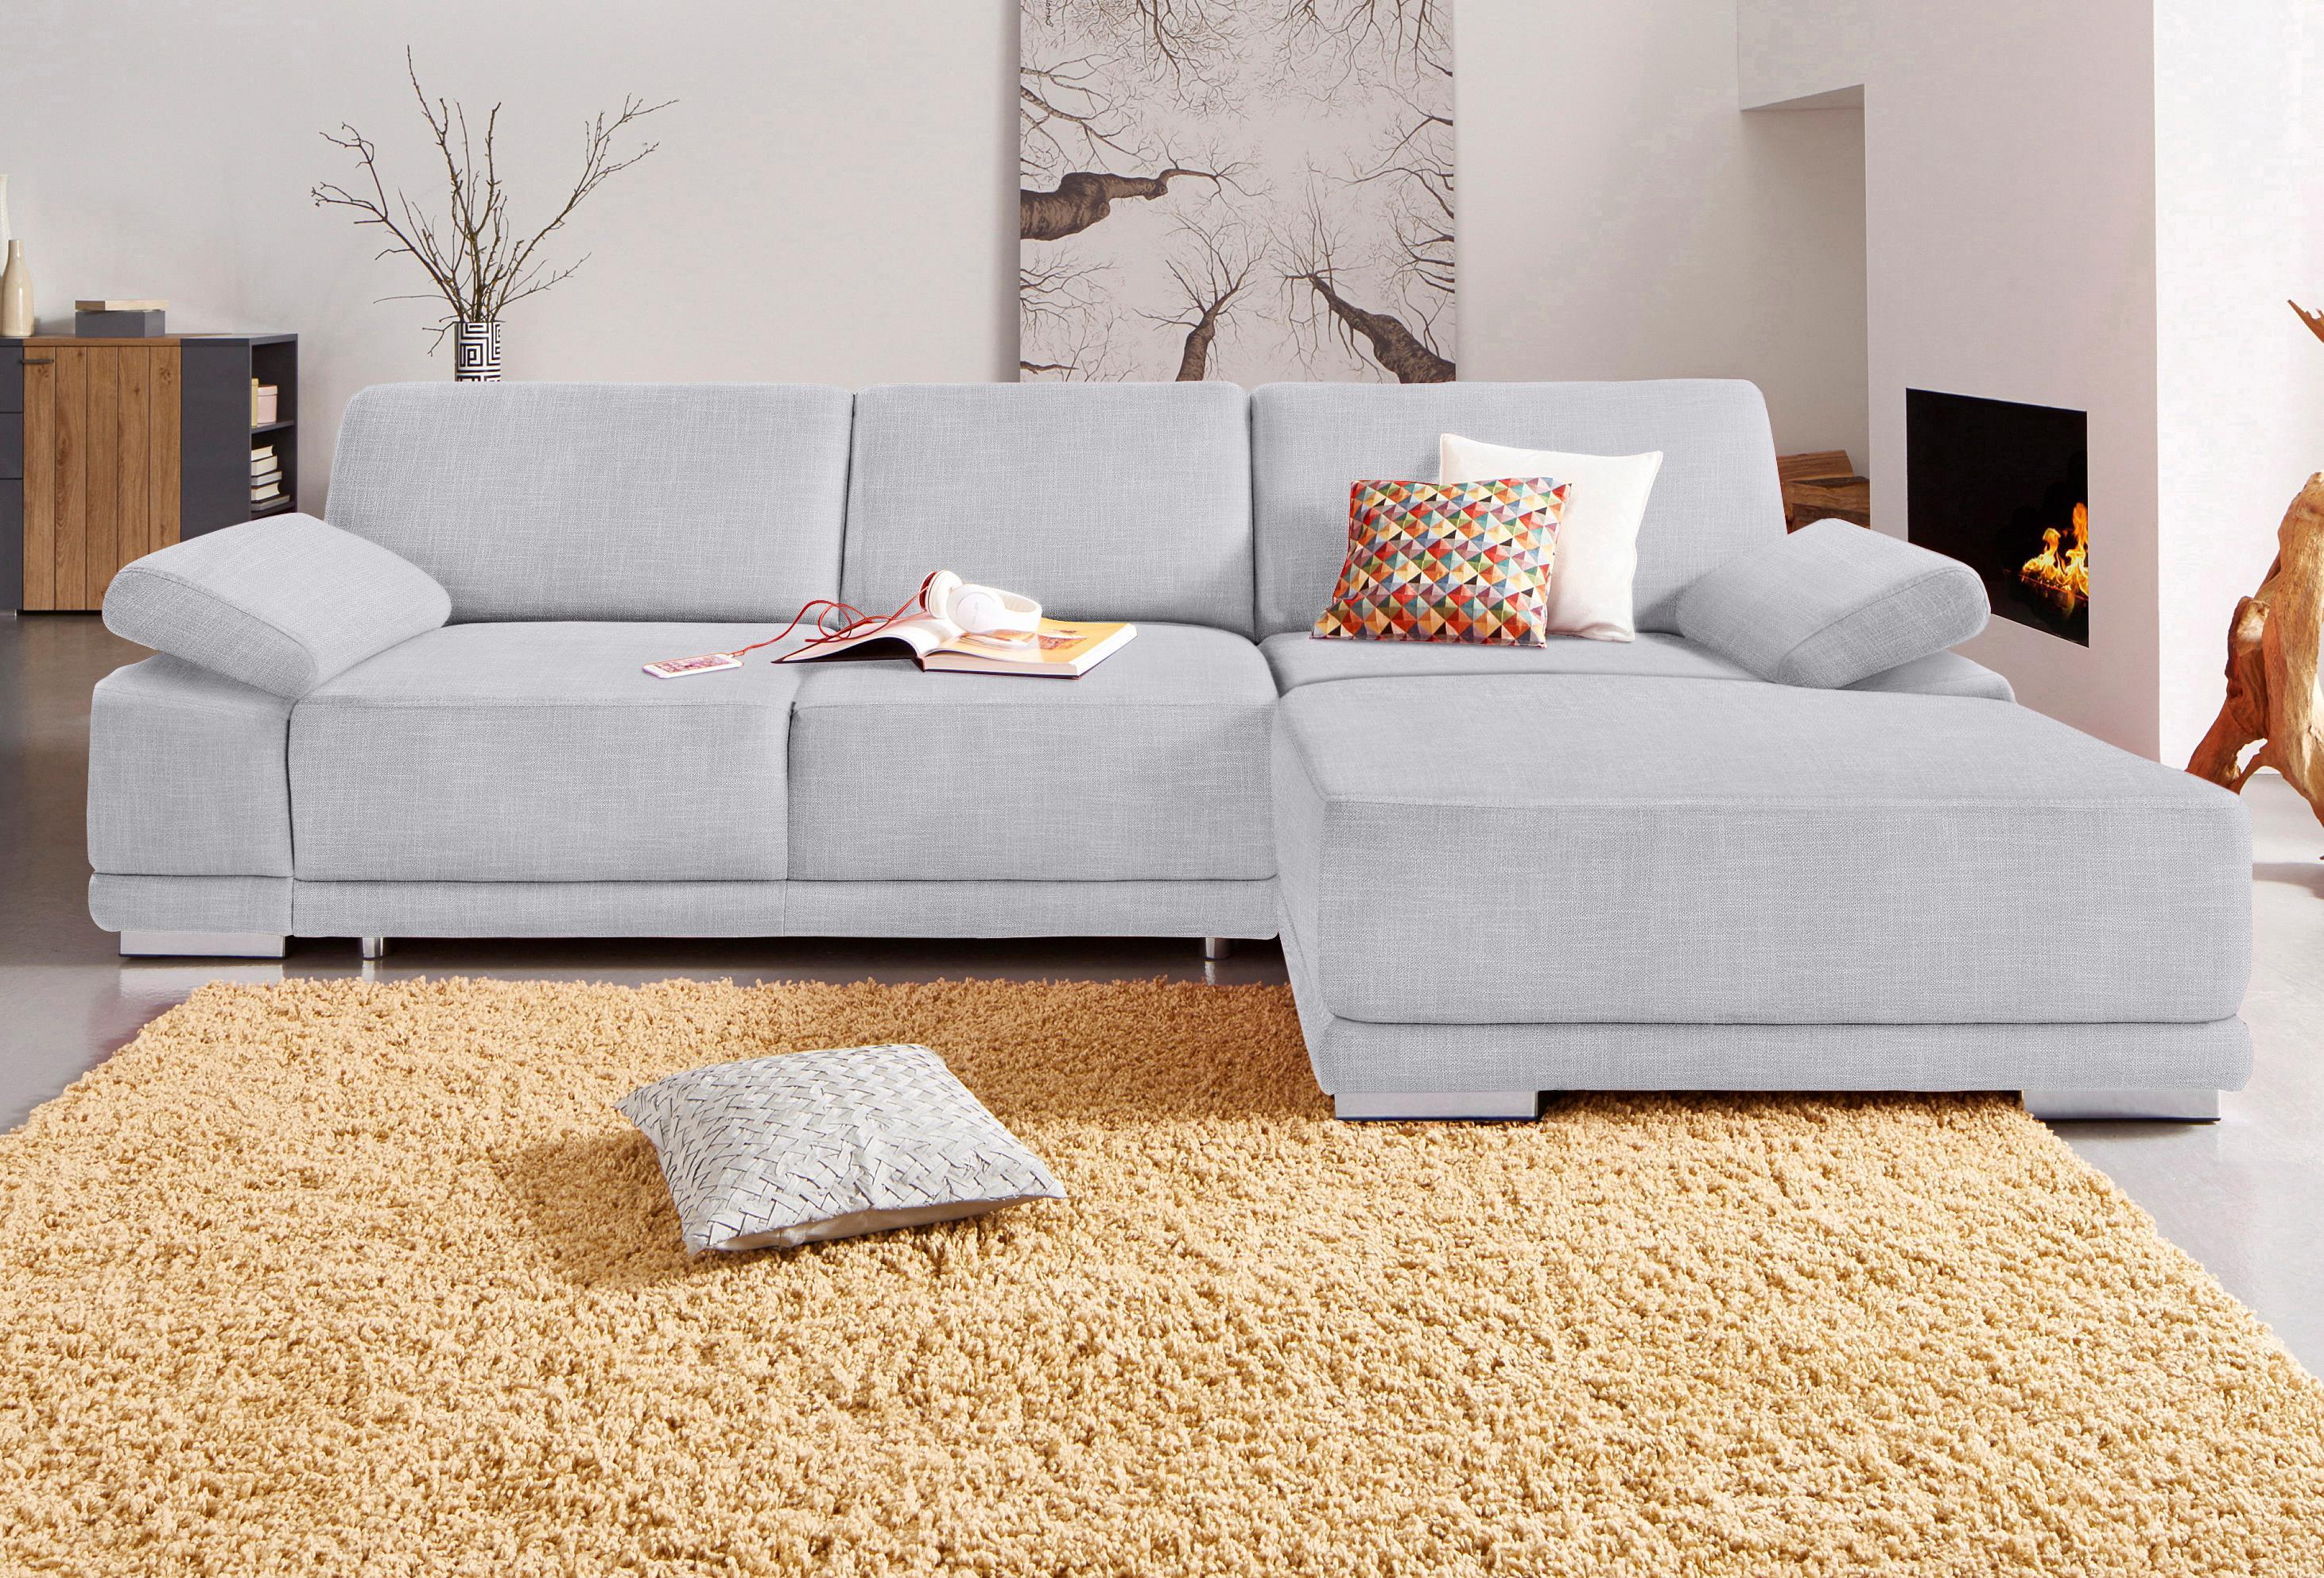 sit more polsterecke mit xl recamiere wahlweise mit bettfunktion moebel suchmaschine. Black Bedroom Furniture Sets. Home Design Ideas